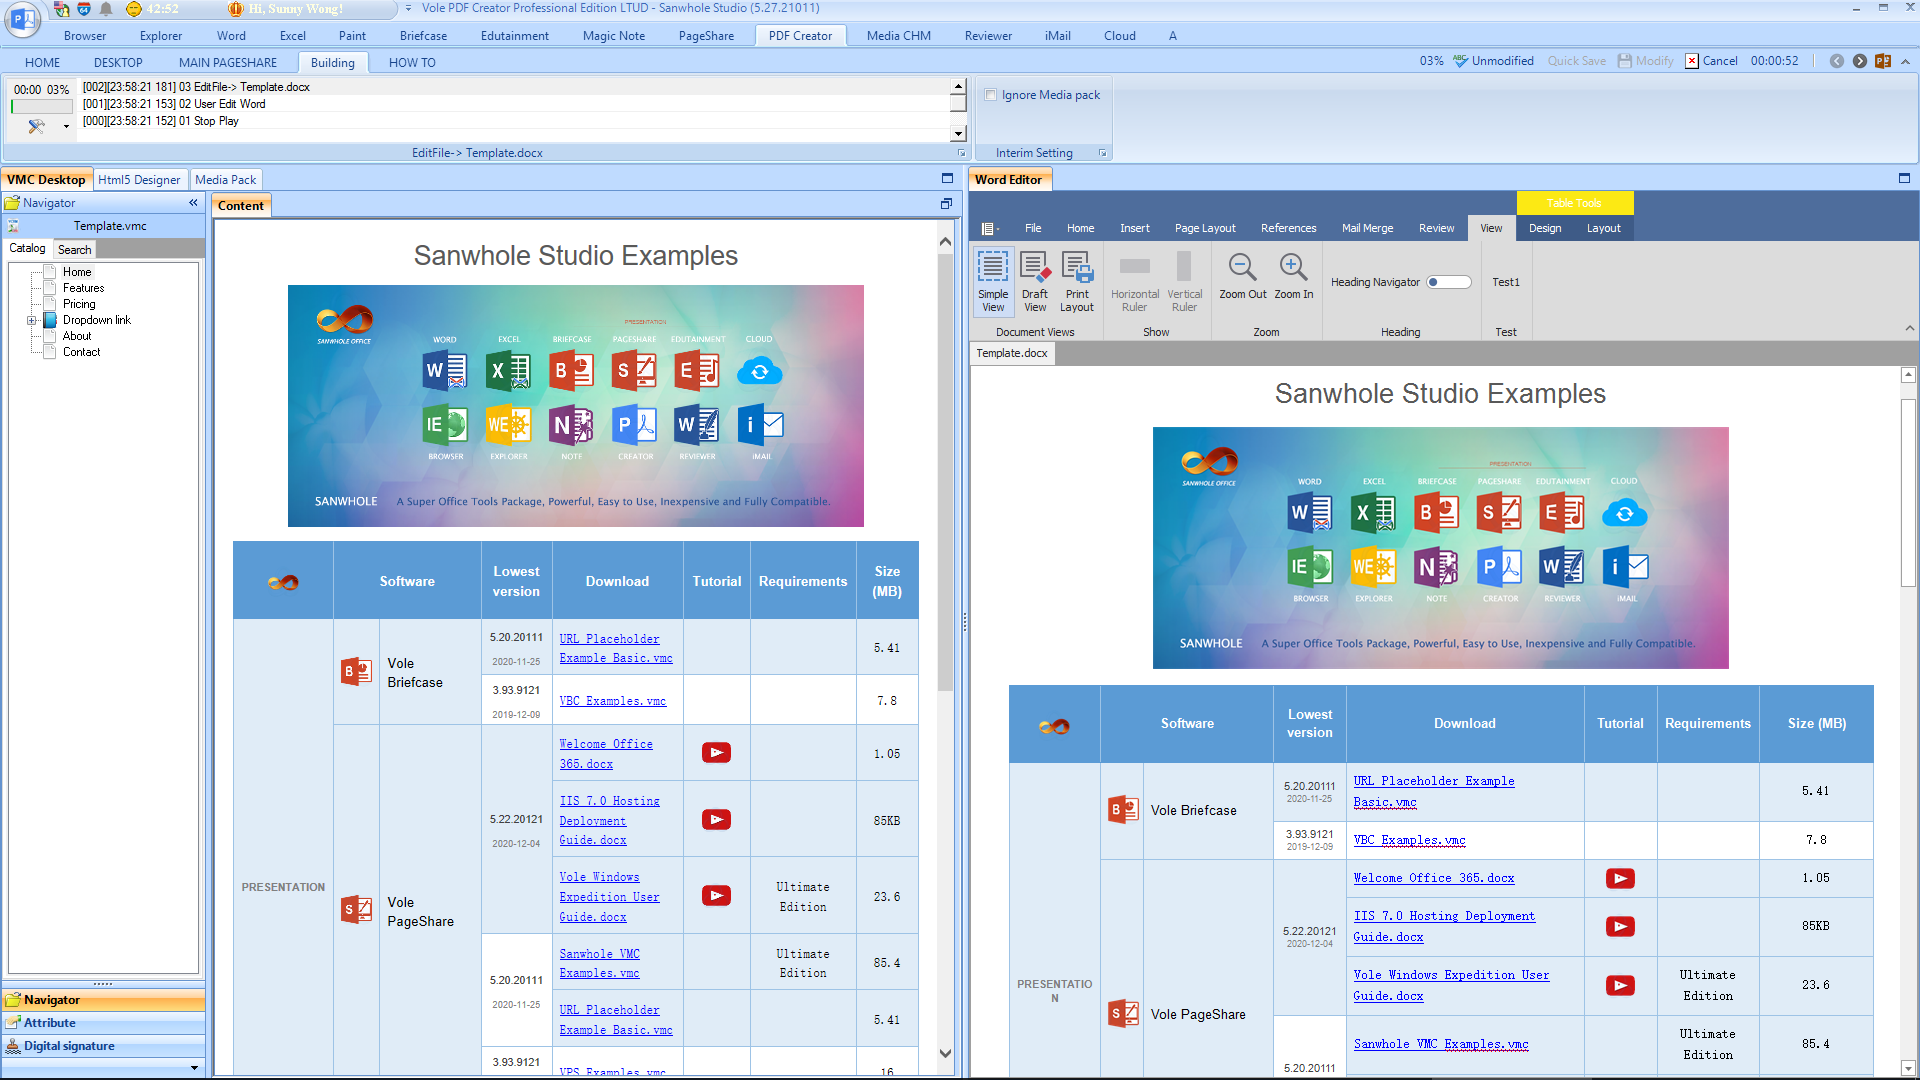 Vole PDF Creator Professional Edition Screenshot 9